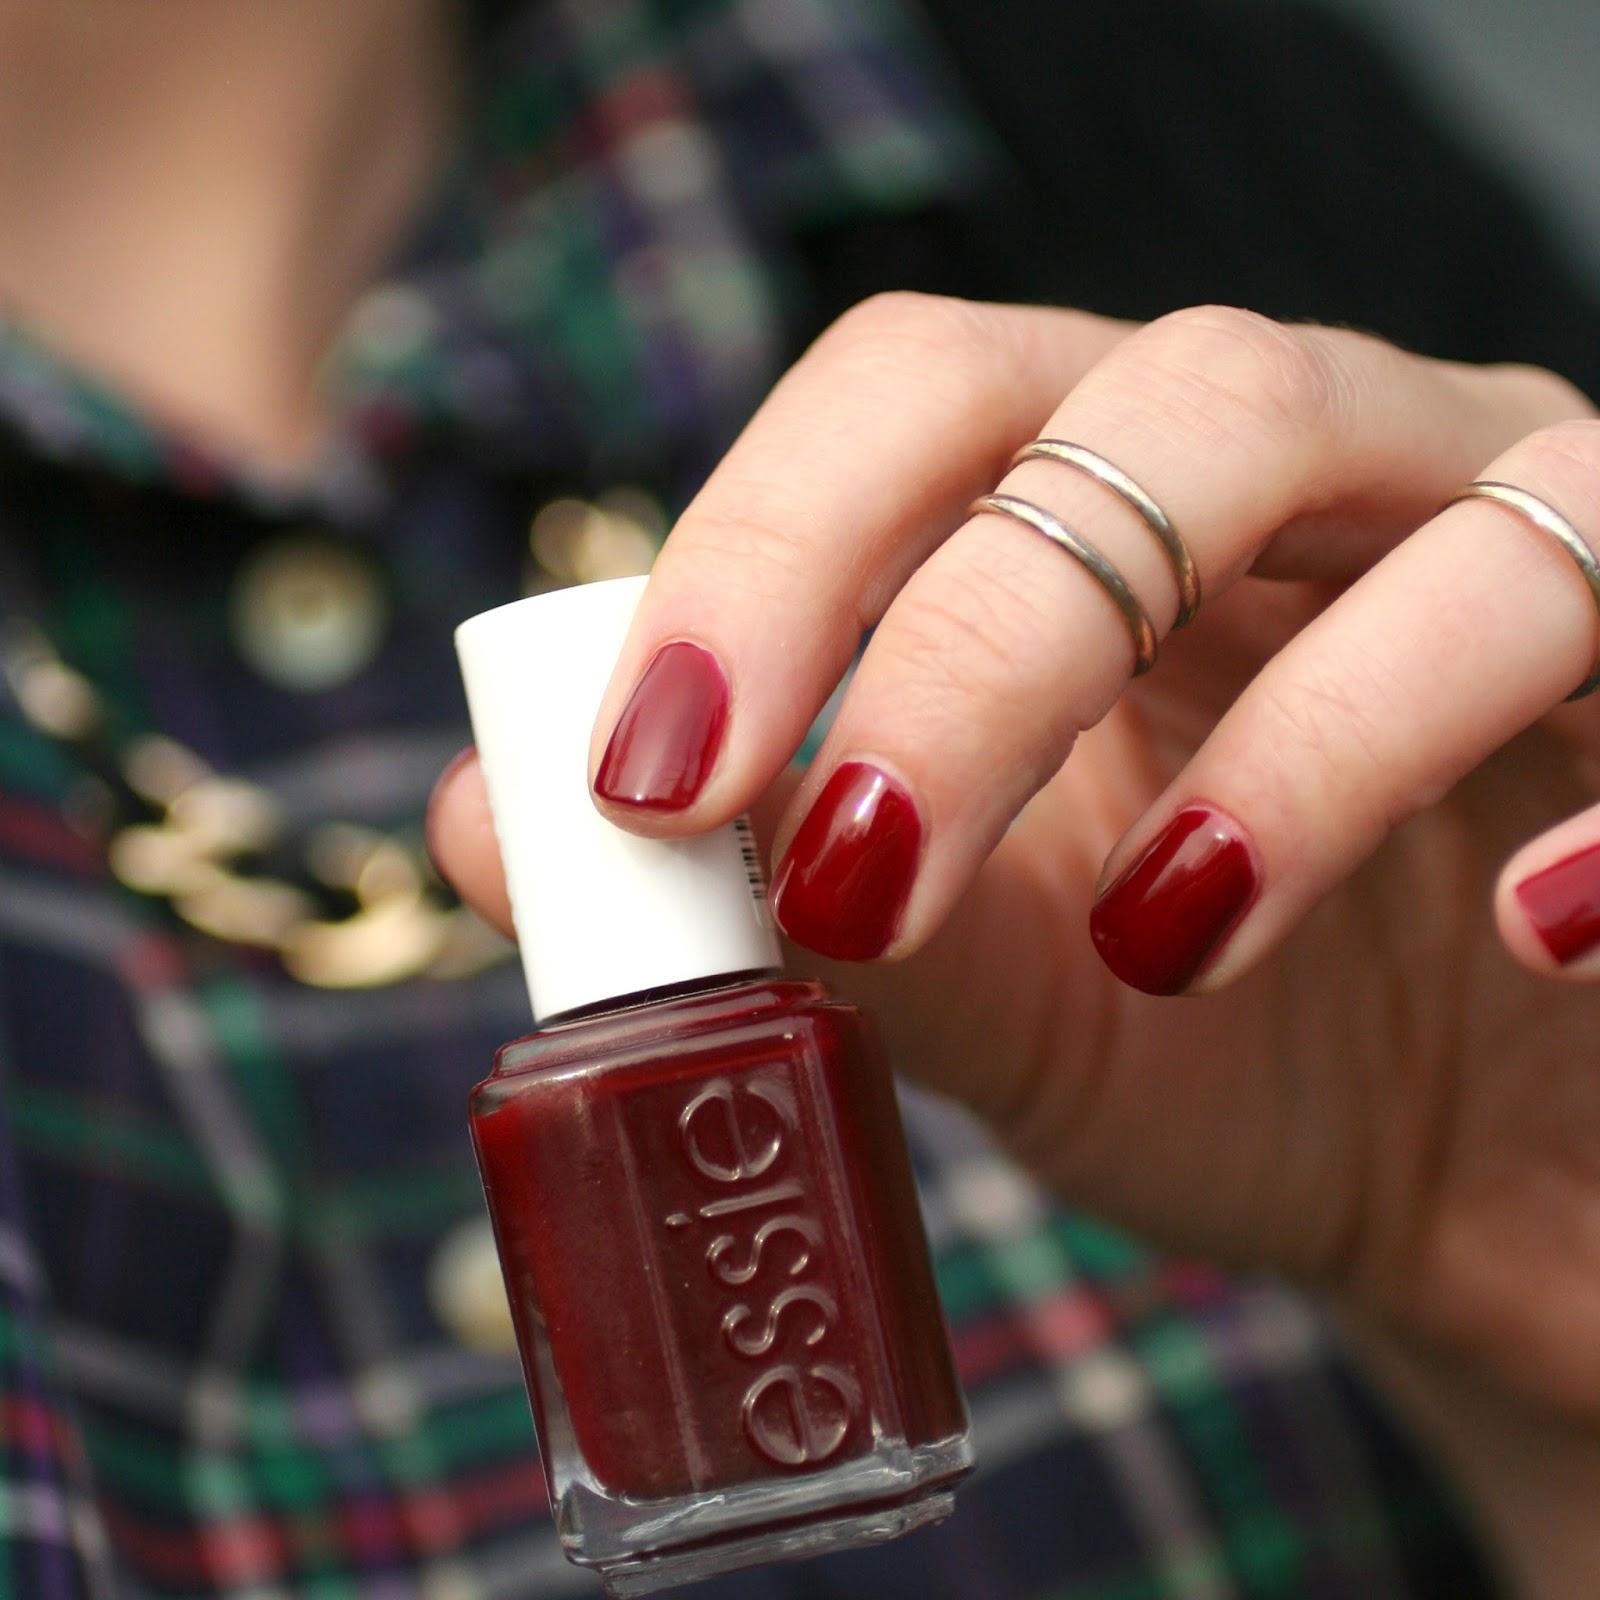 Classics : Essie Bordeaux | Essie Envy